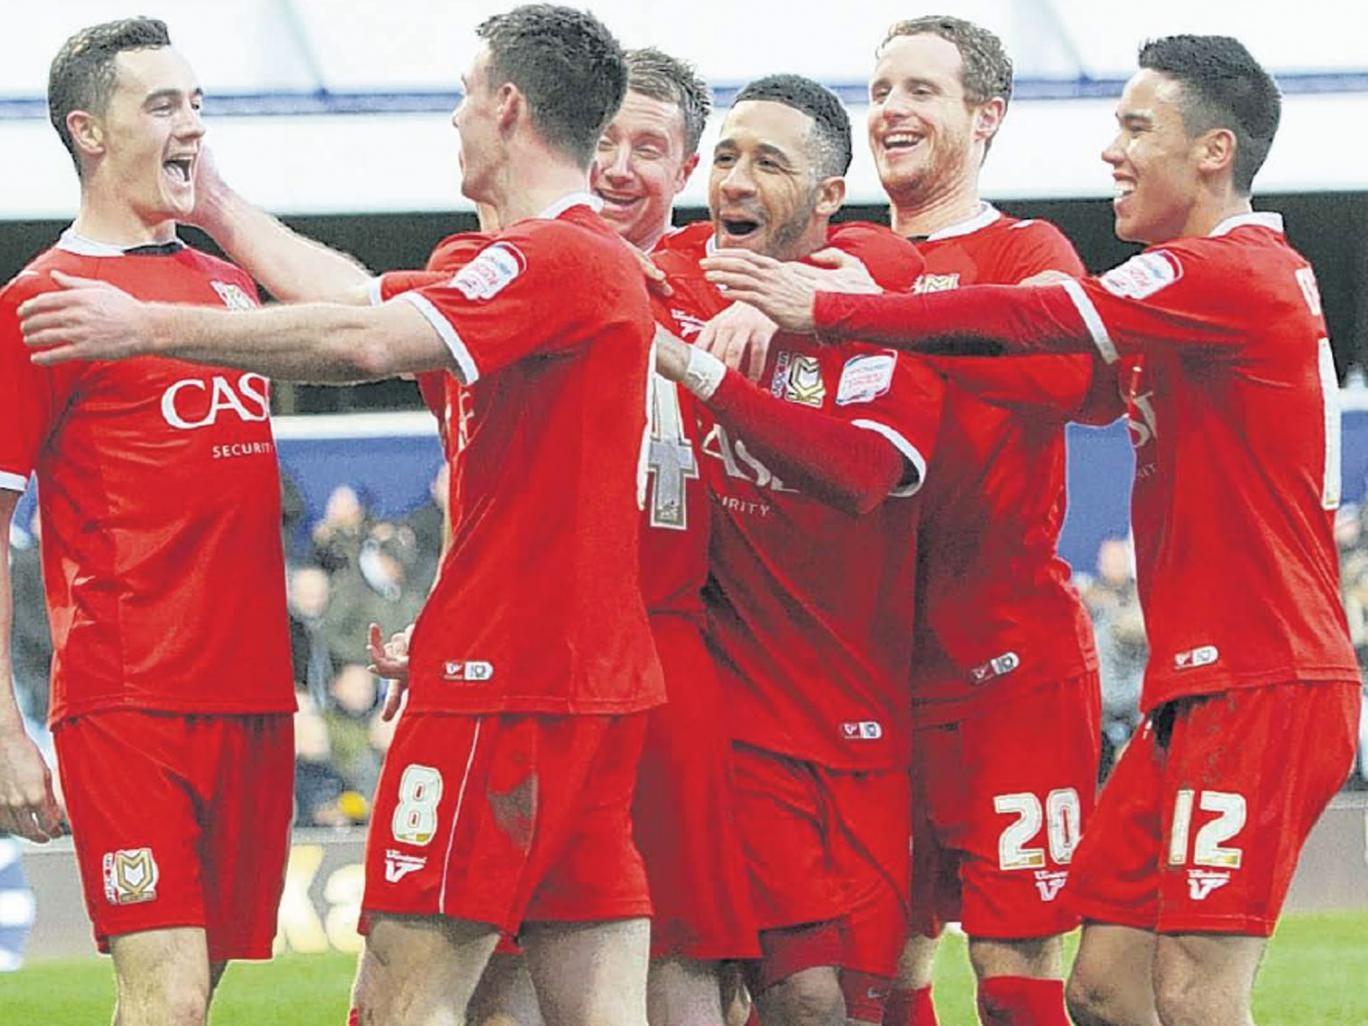 MK Dons' Darren Potter celebrates with his team-mates